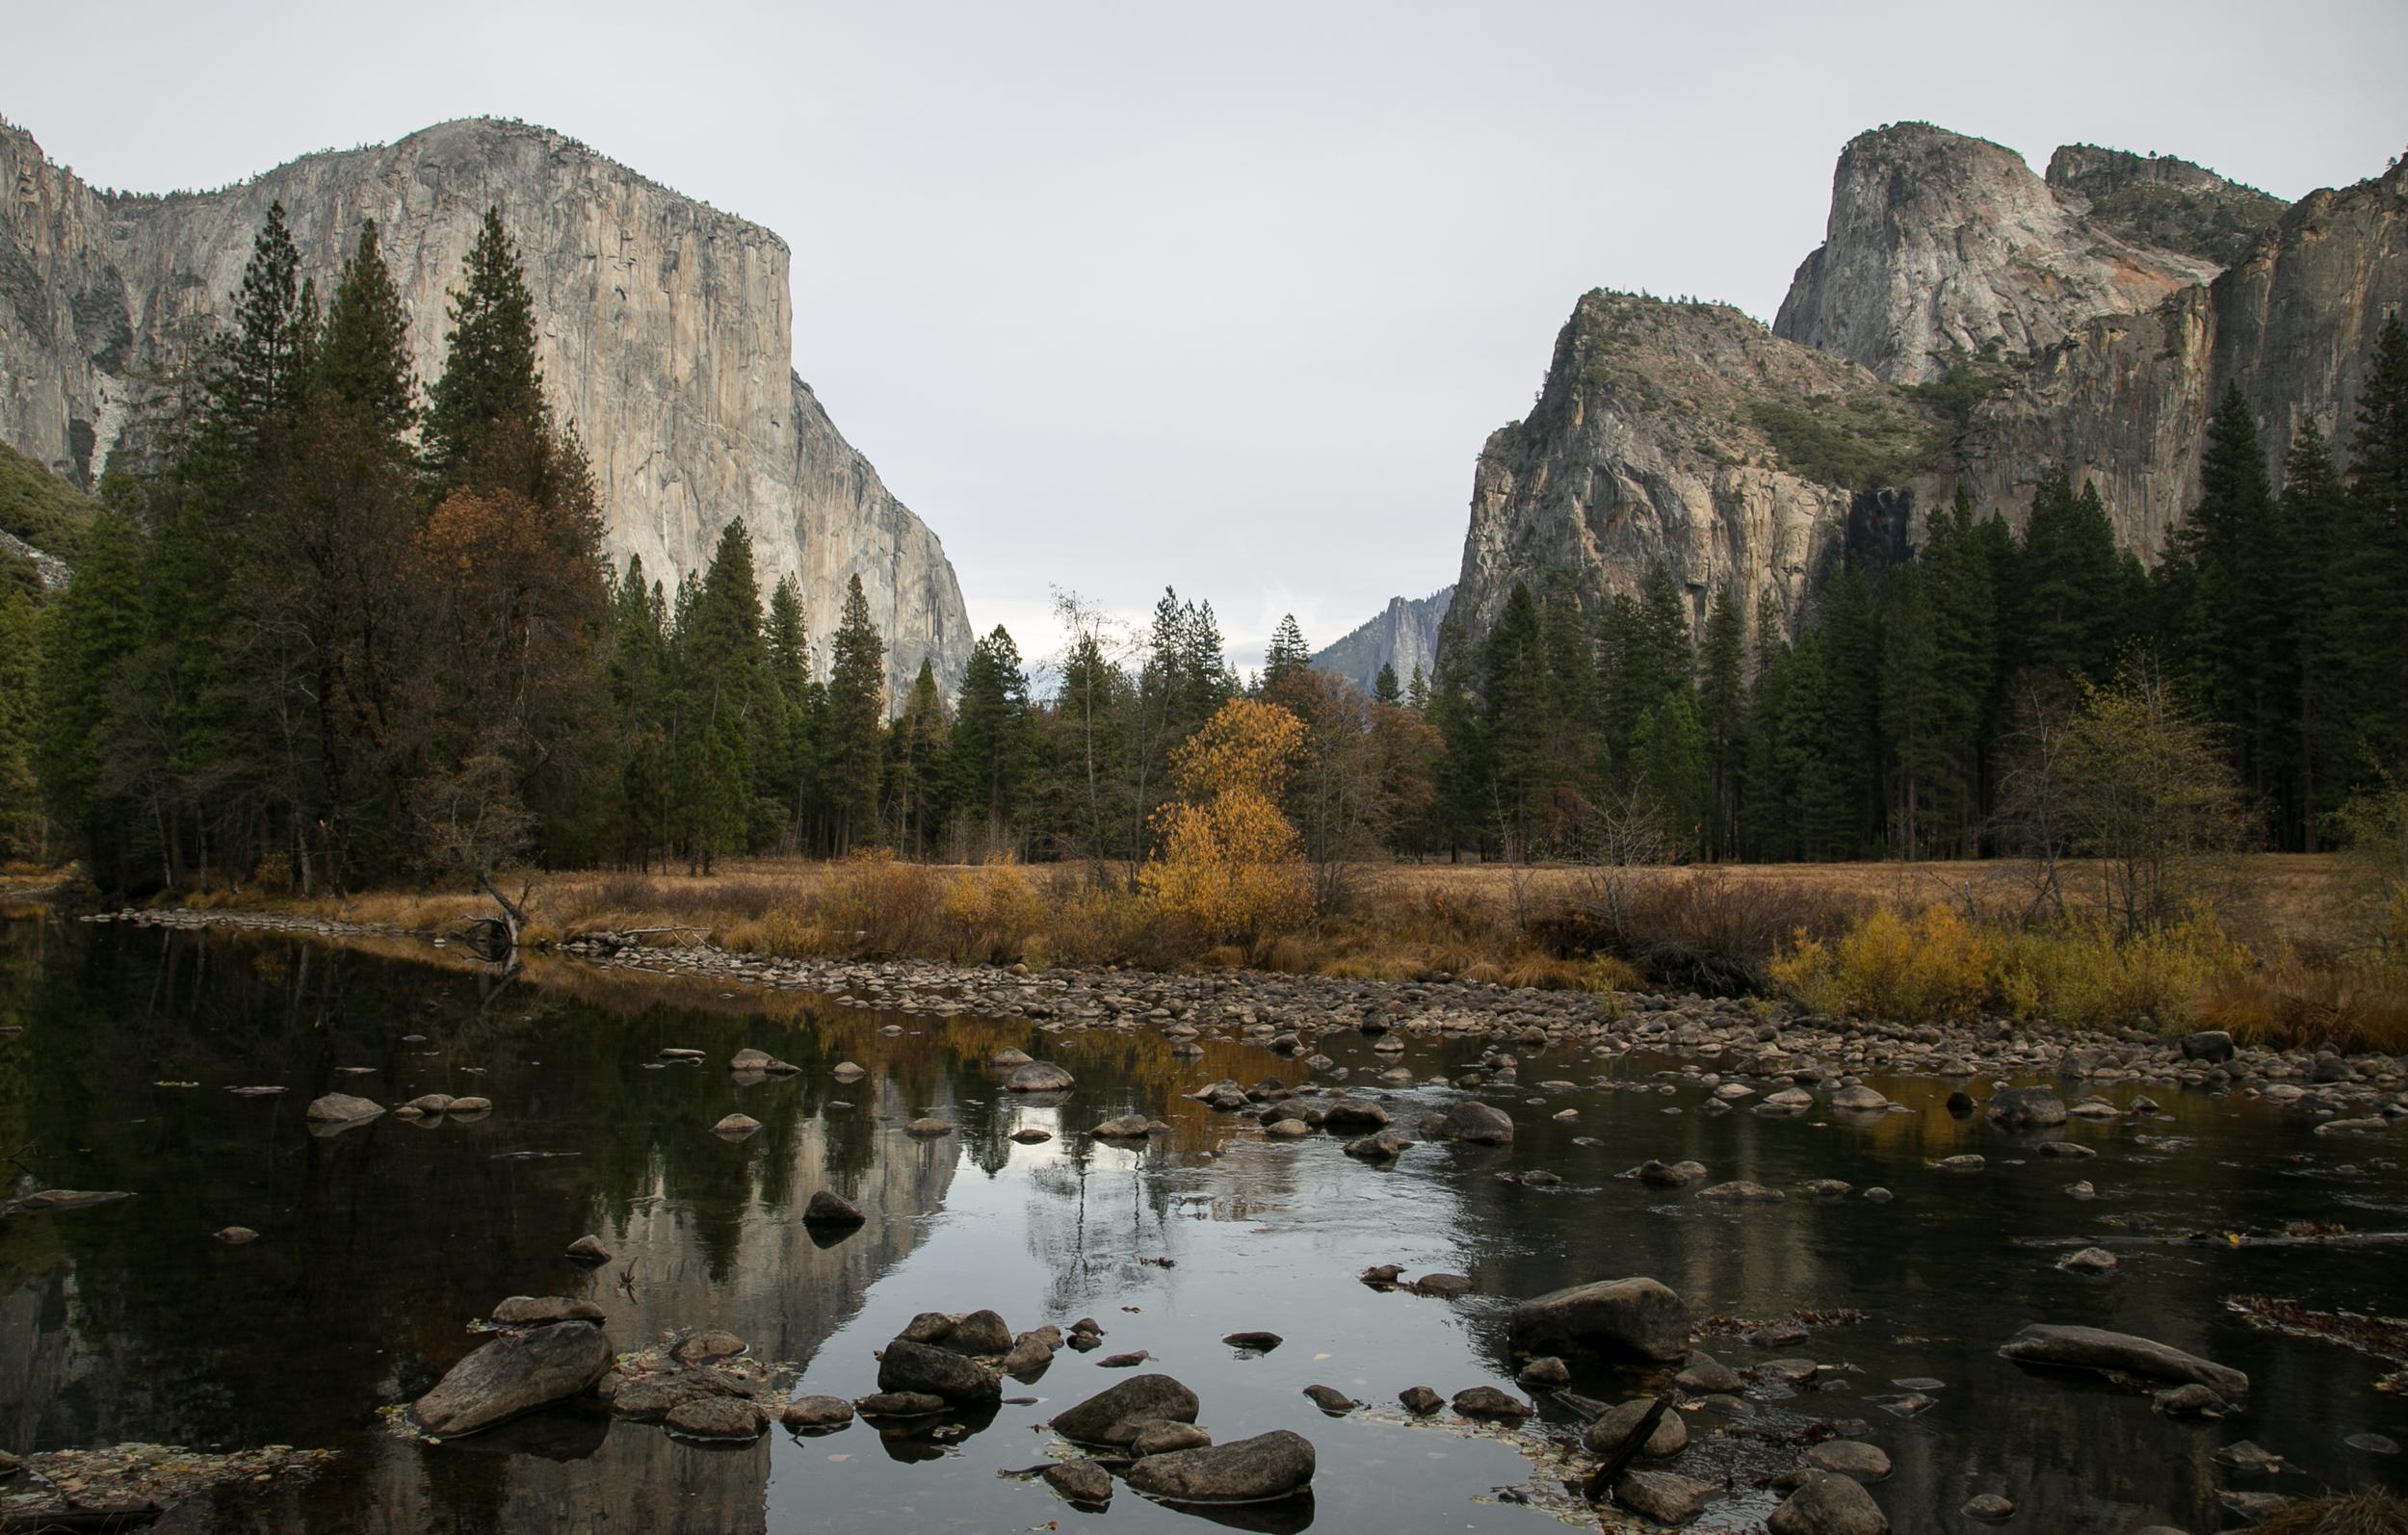 Yosemite Valley, Yosemite National Park. California.